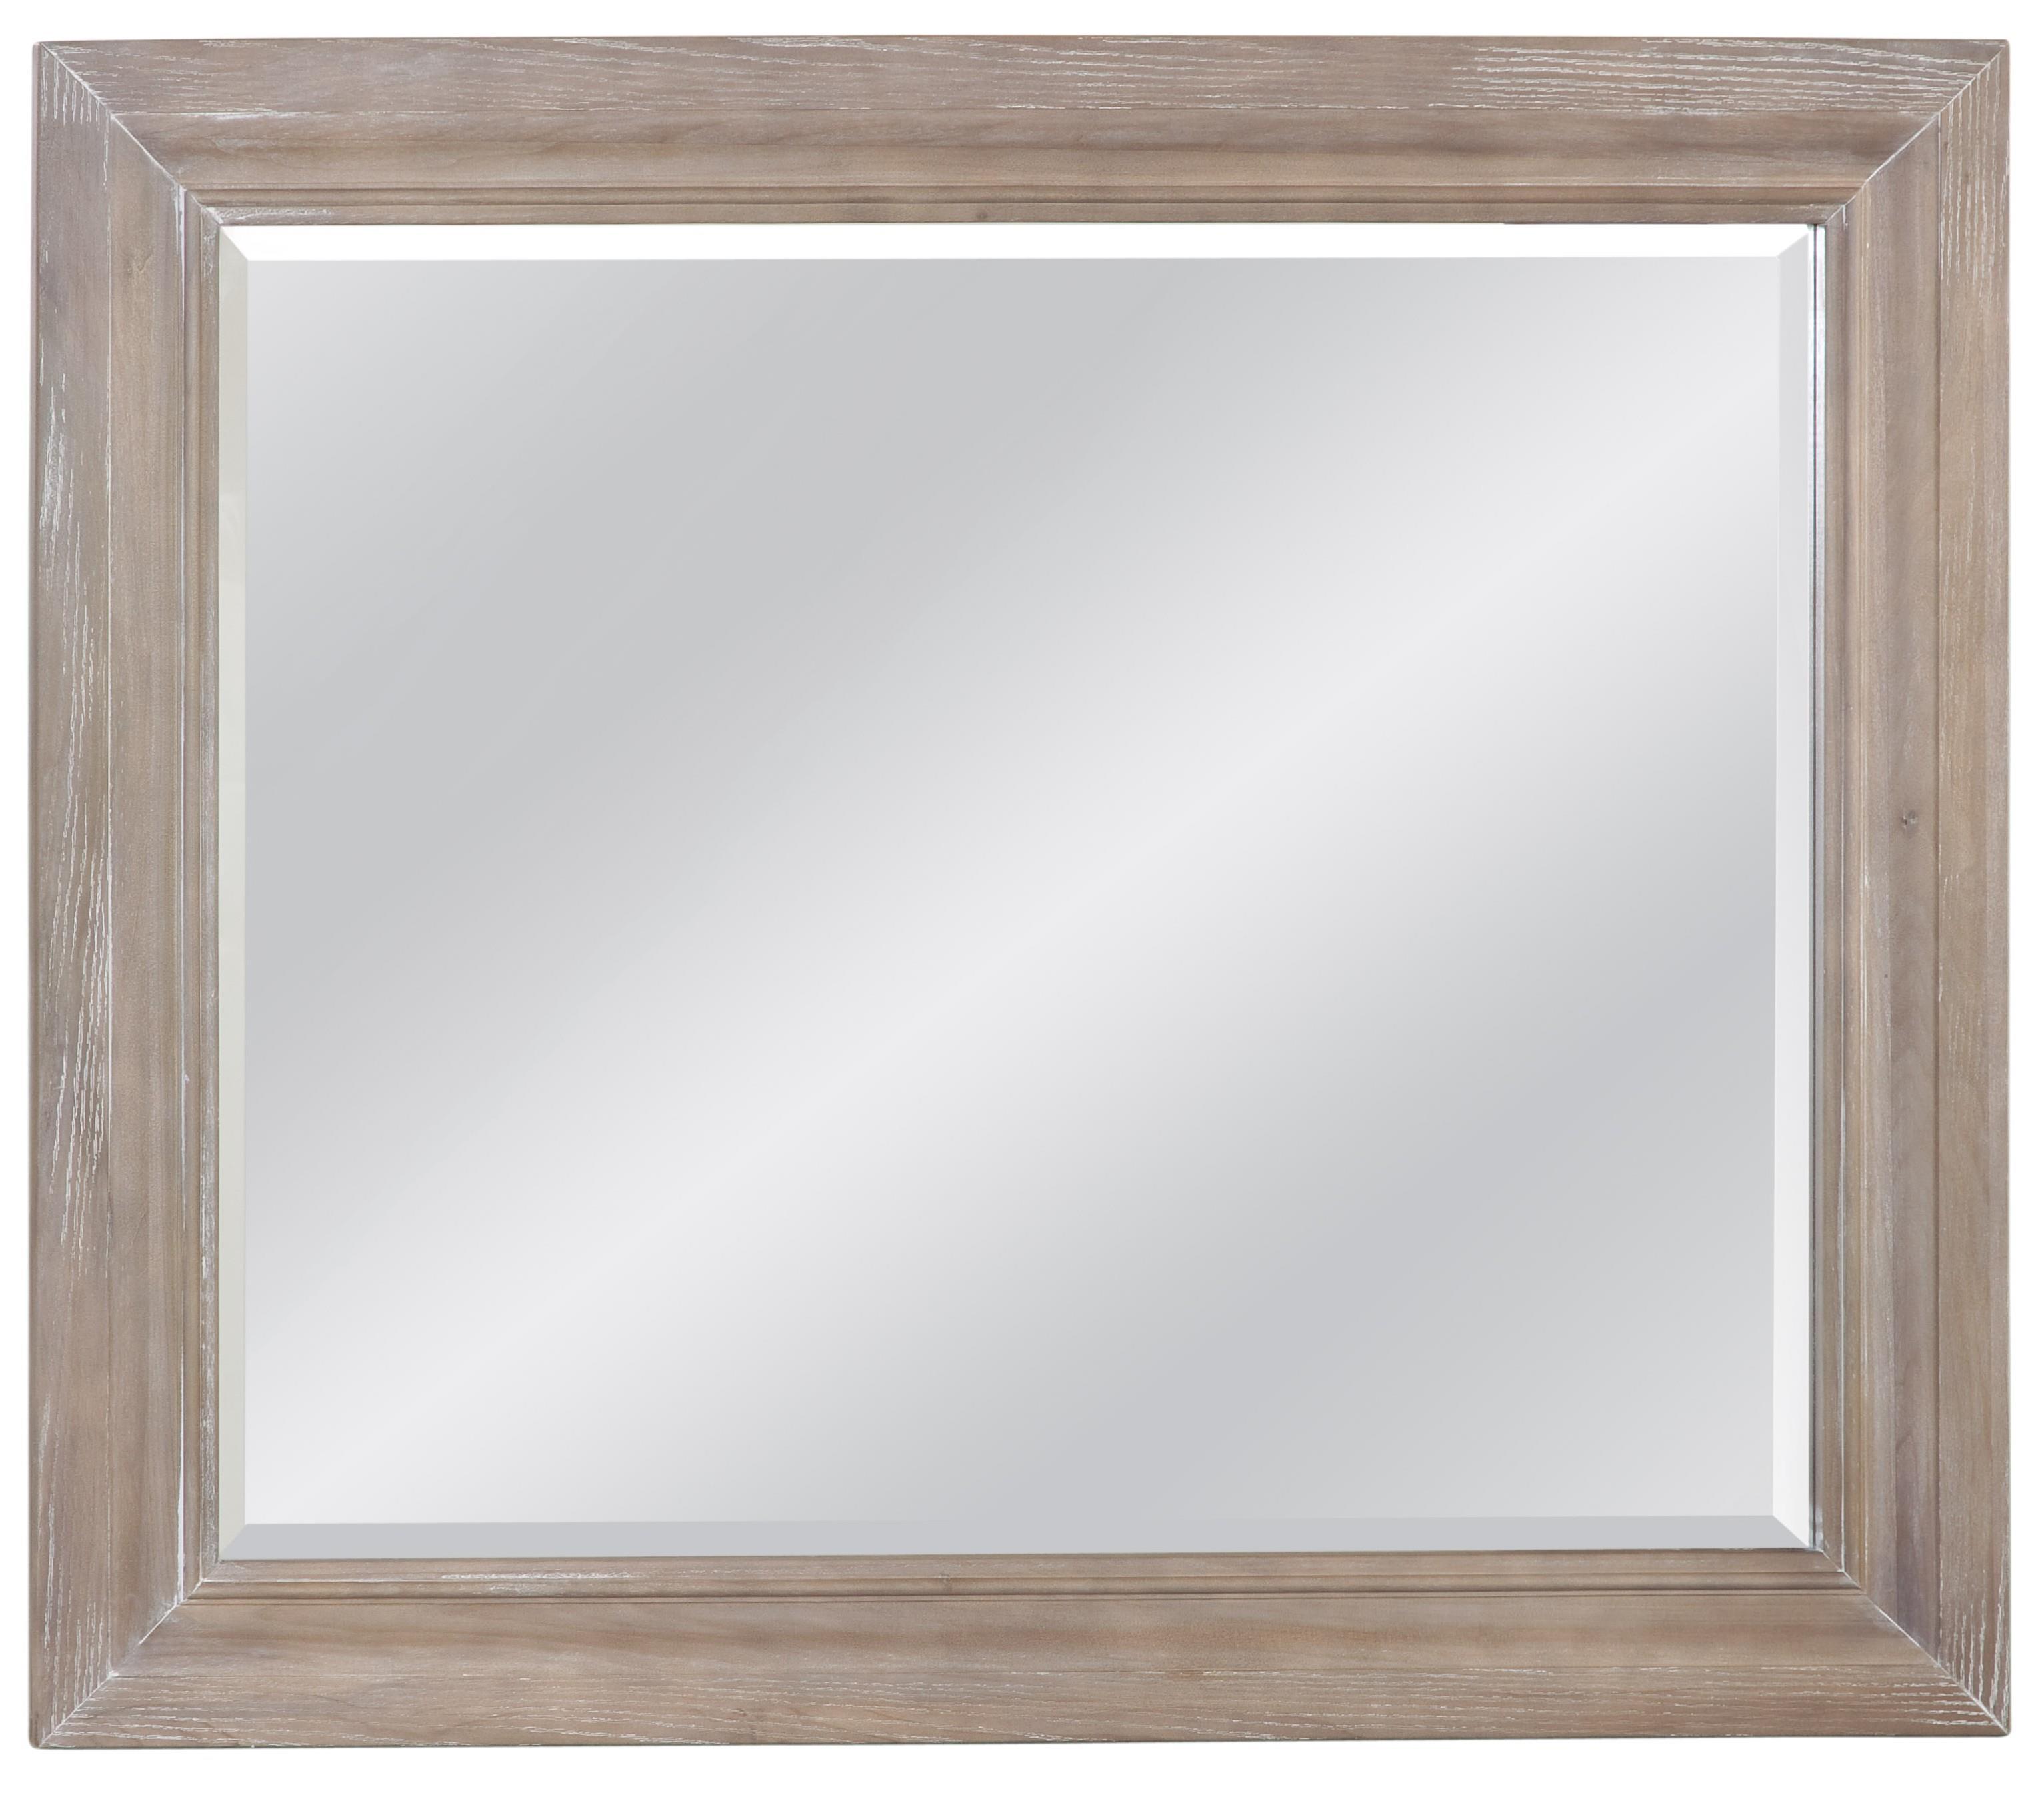 Vaughan Bassett Affinity Landscape Mirror - Beveled glass - Item Number: 564-446